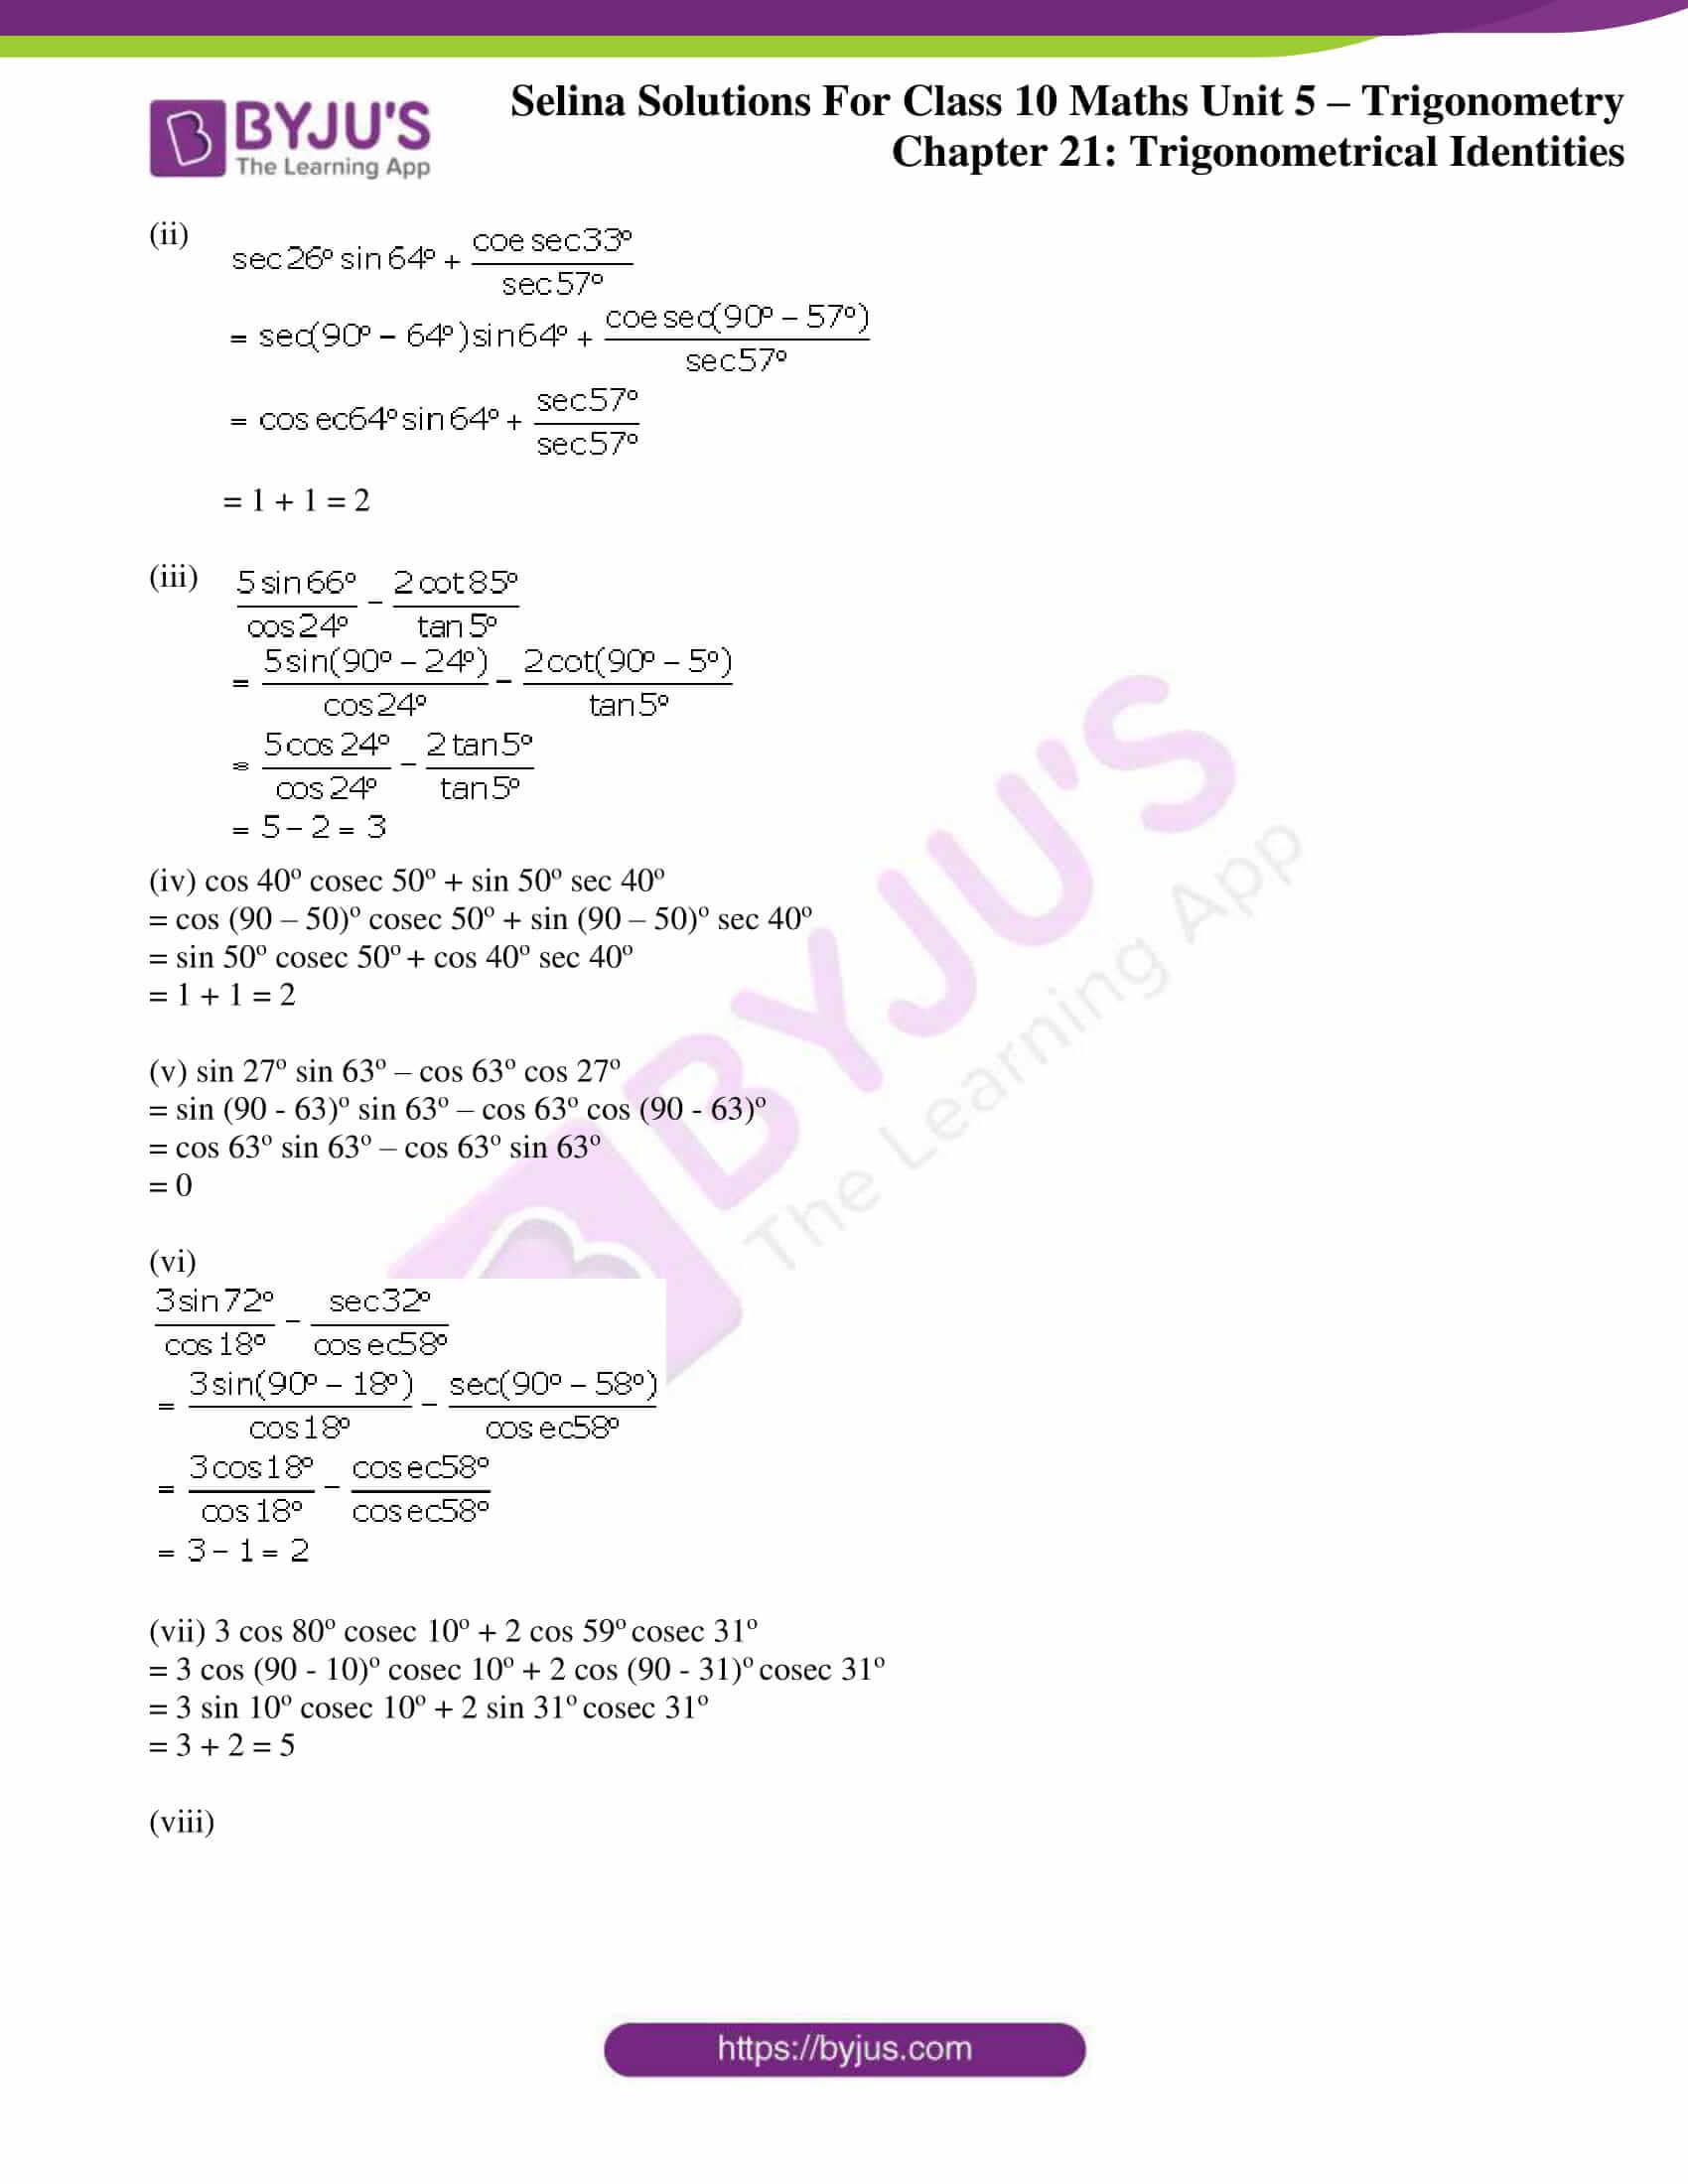 selina-sol-maths-class-10-ch-21-ex-e-11